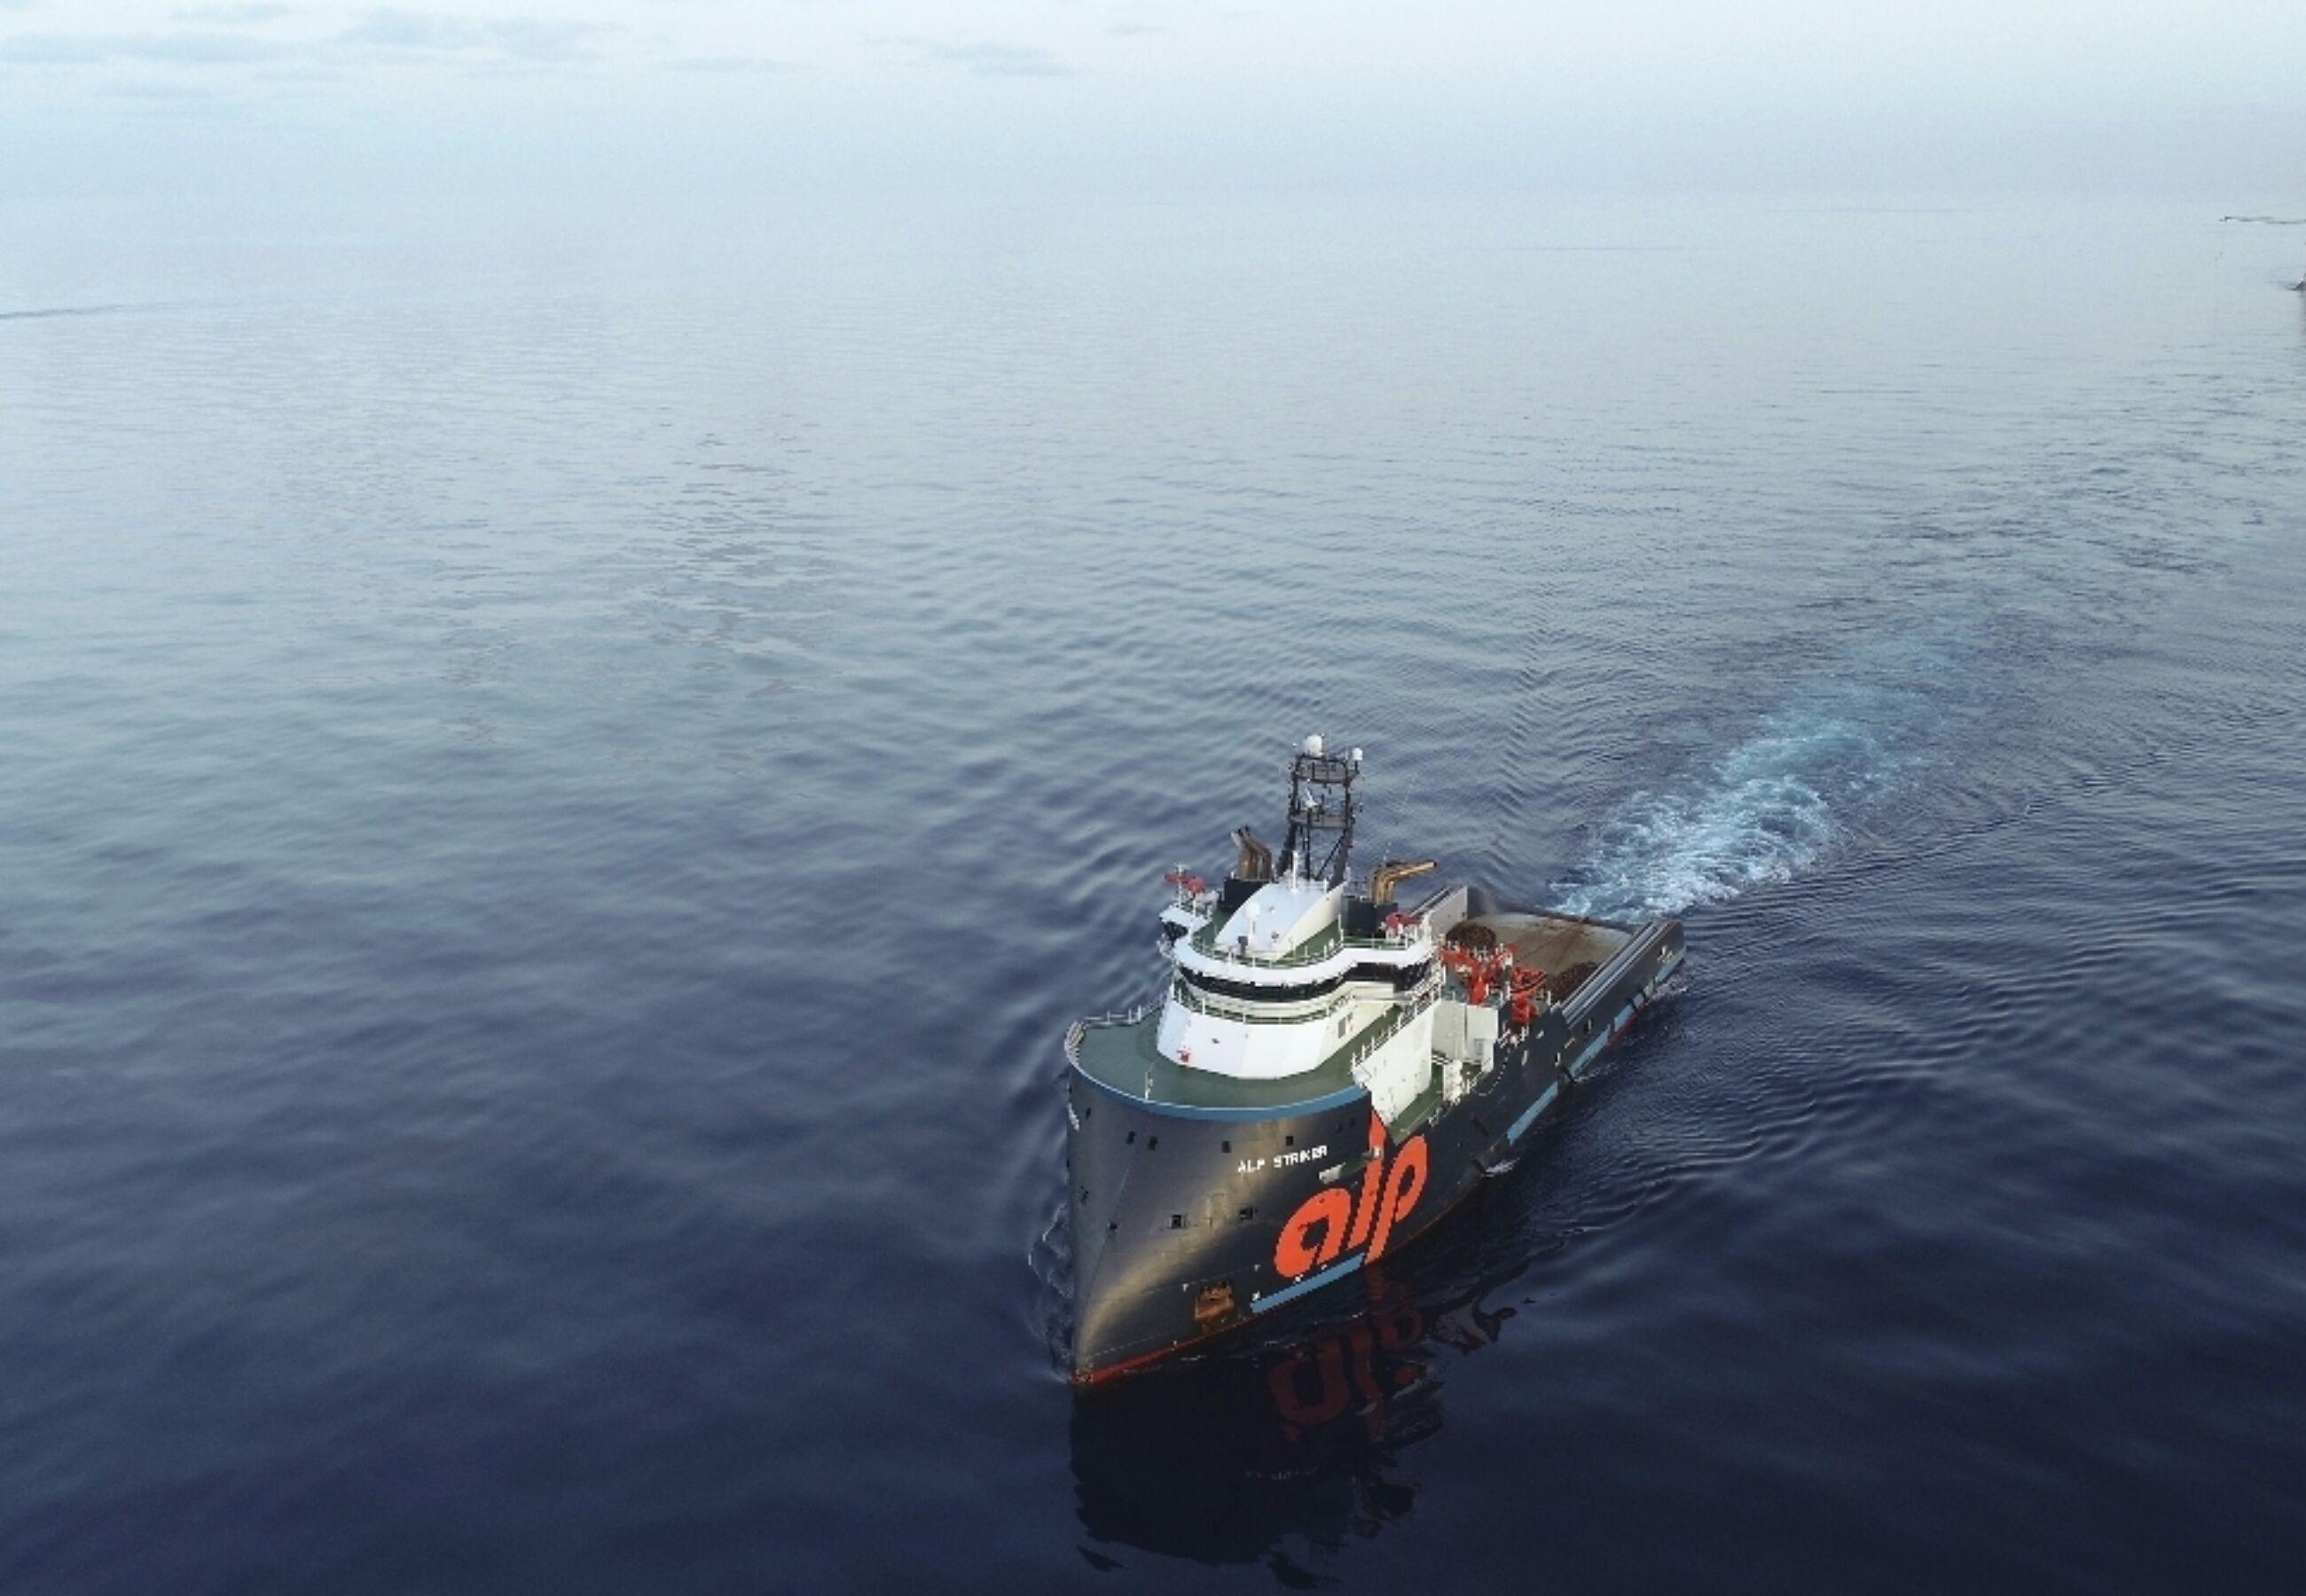 ALP Striker towing West Capricorn